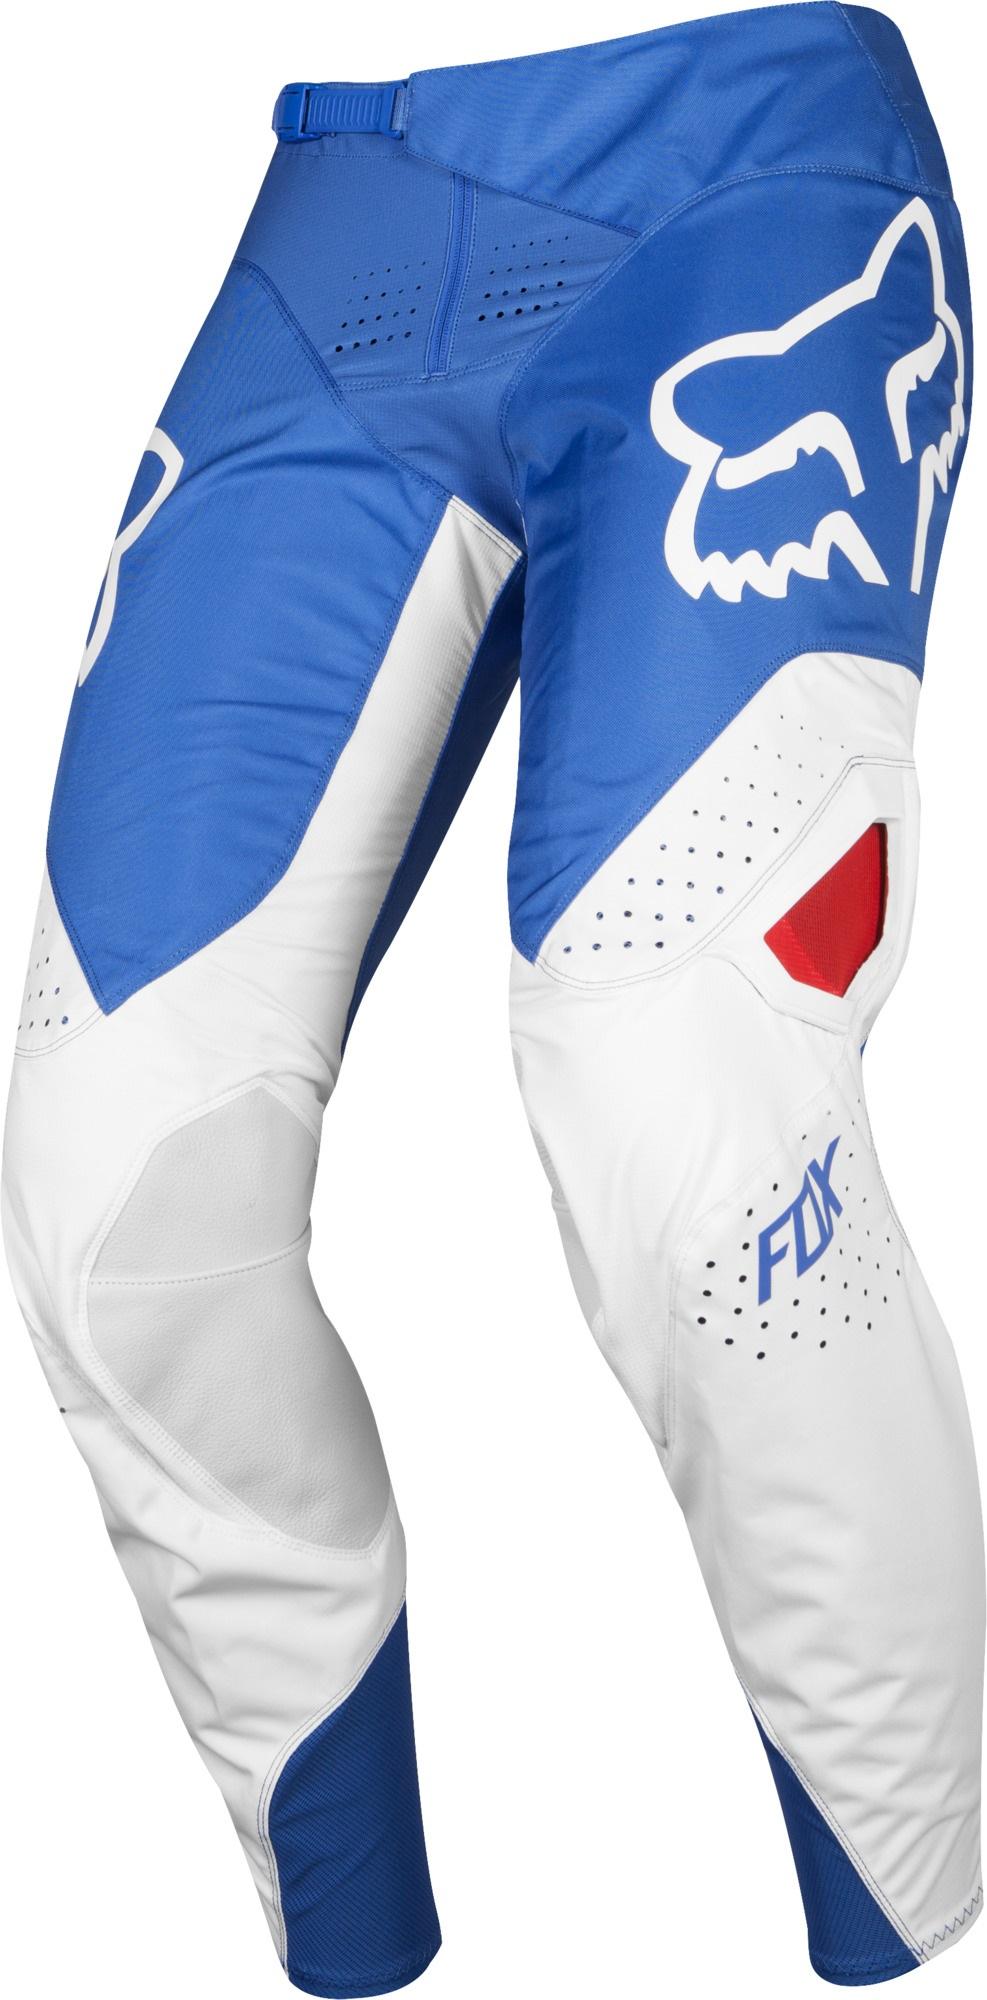 FOX 360 Kila Pant, Blue/Red MX19